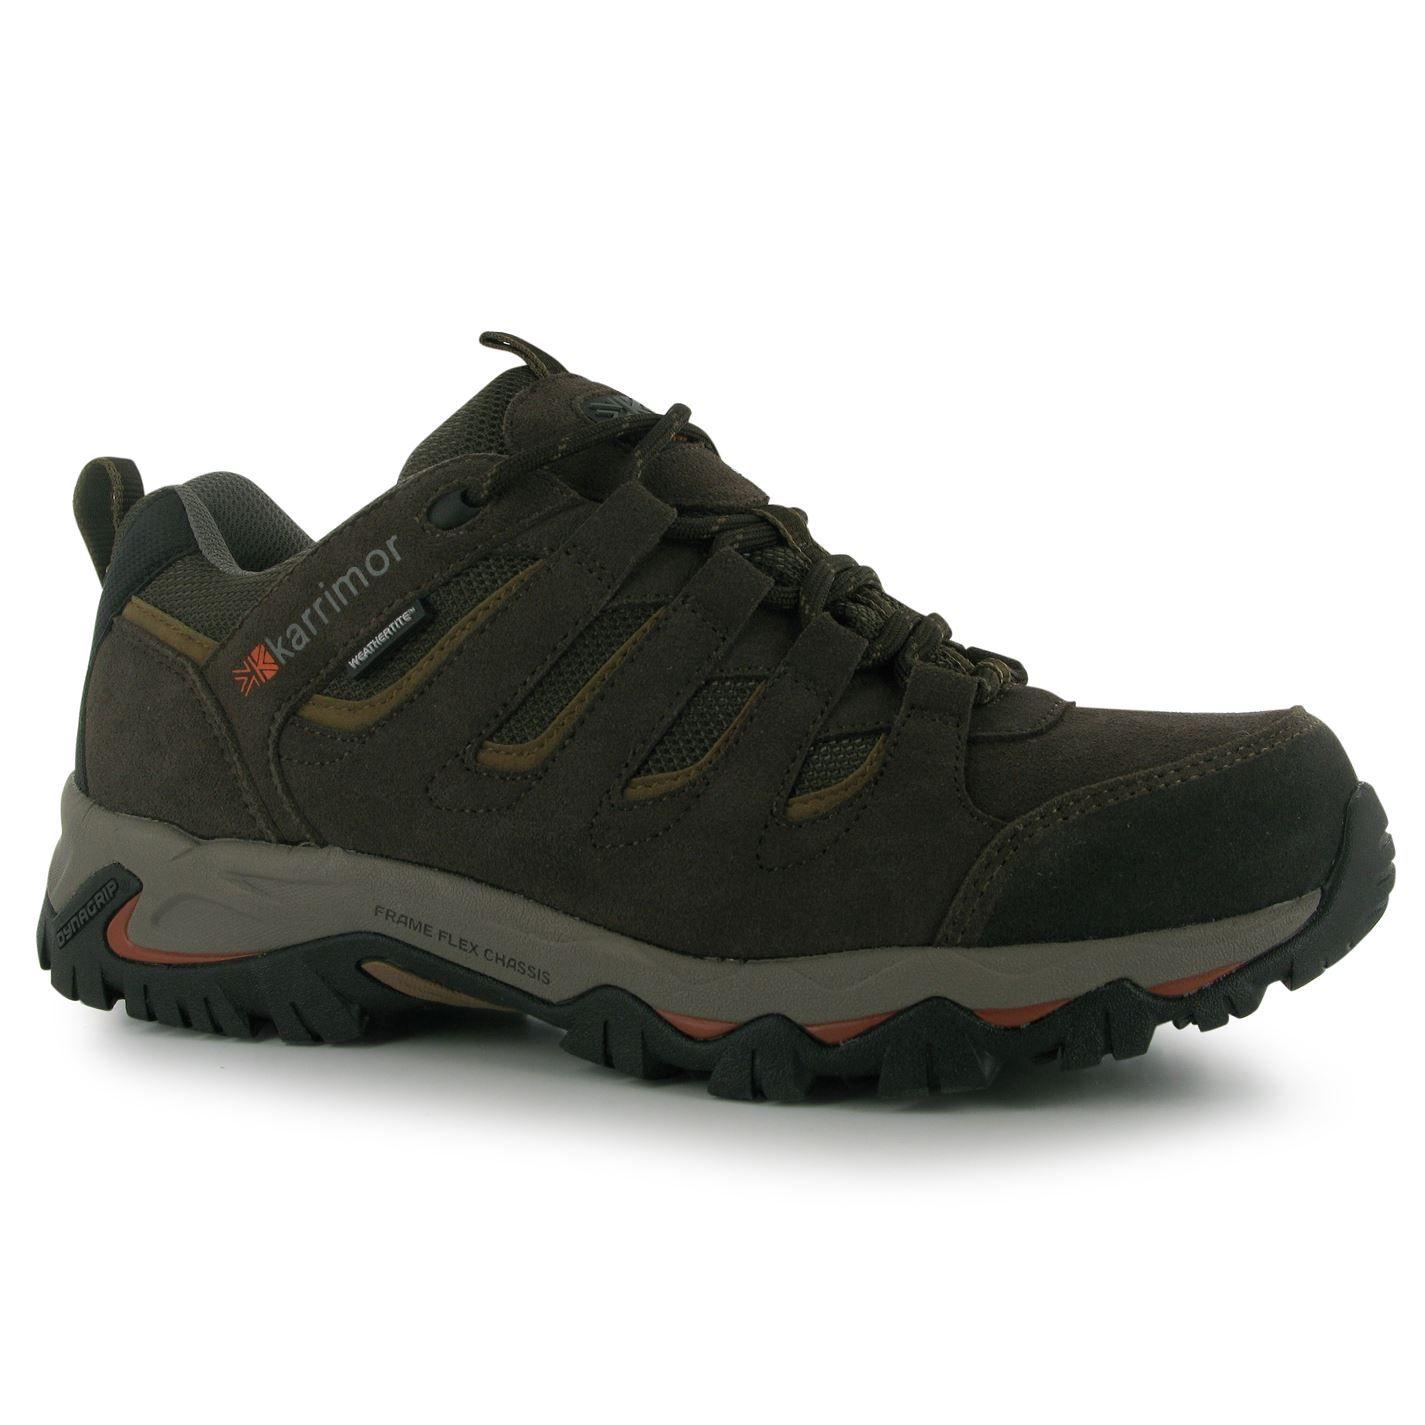 Karrimor Kids Mount Low Junior Walking Shoes Waterproof Lace